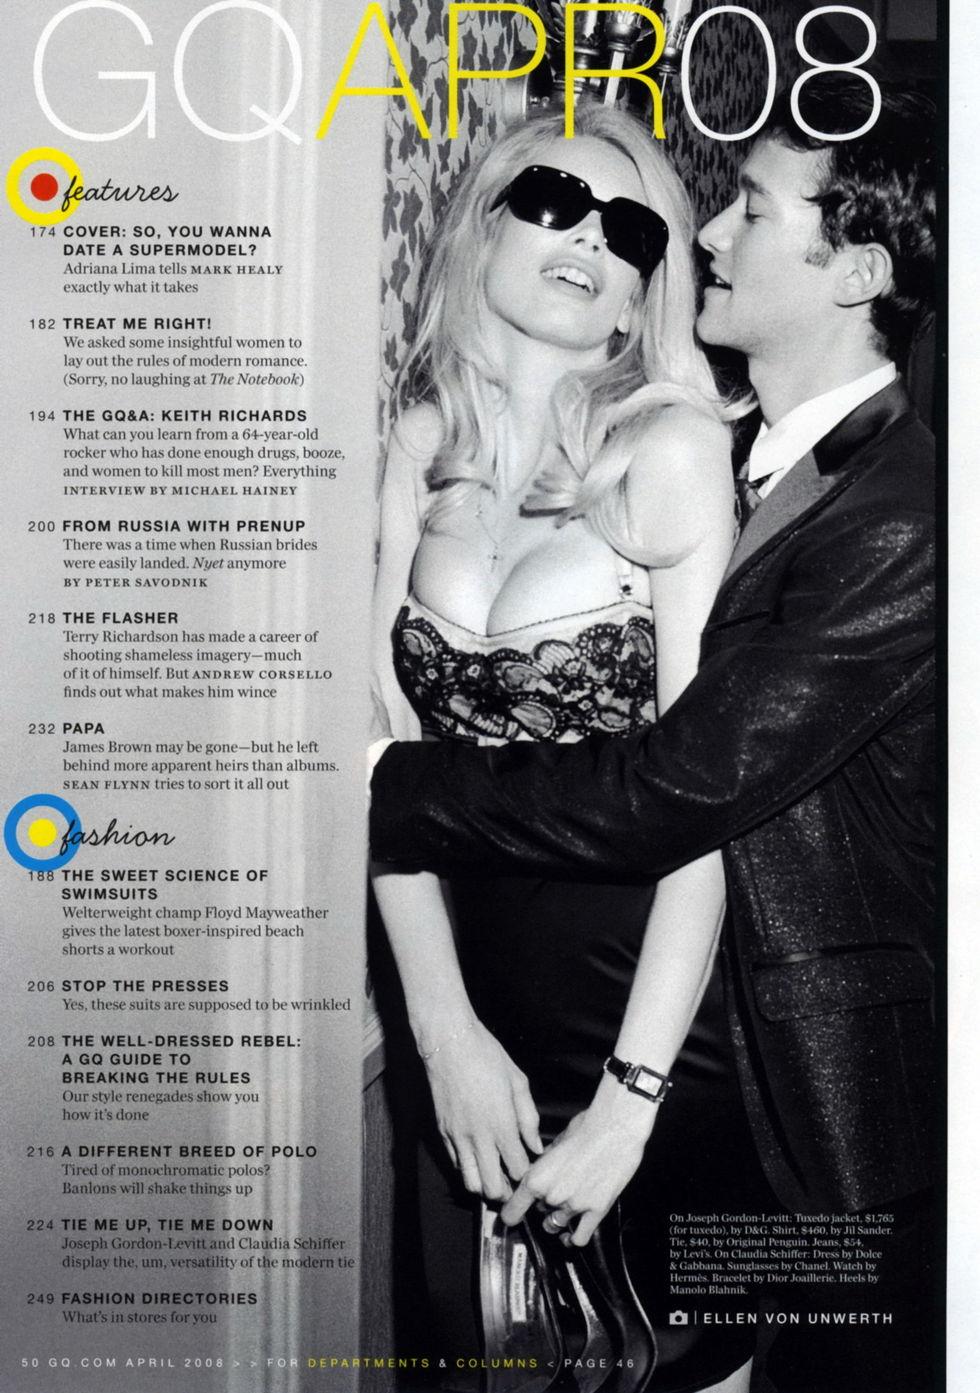 claudia-schiffer-gq-magazine-april-2008-01